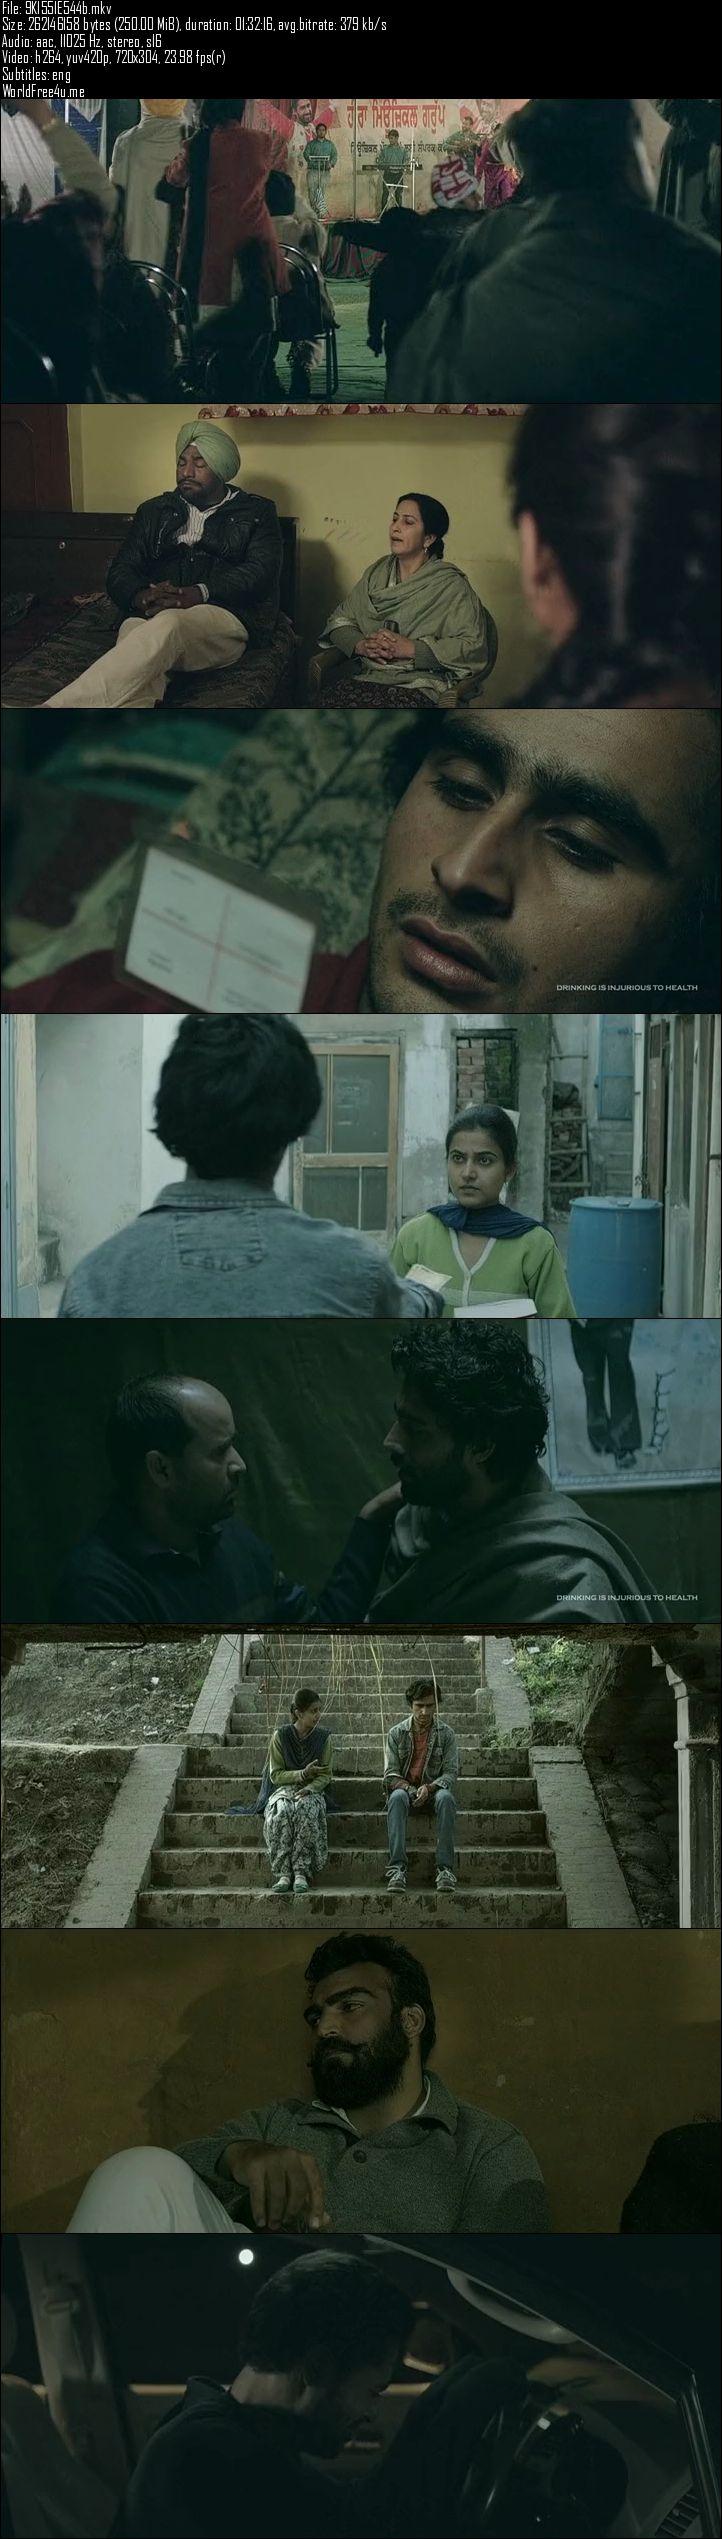 Screen Shot Of Qissa Panjab 2015 Full Movie Free Download 300MB DVDRip 480P ESubs Watch Online